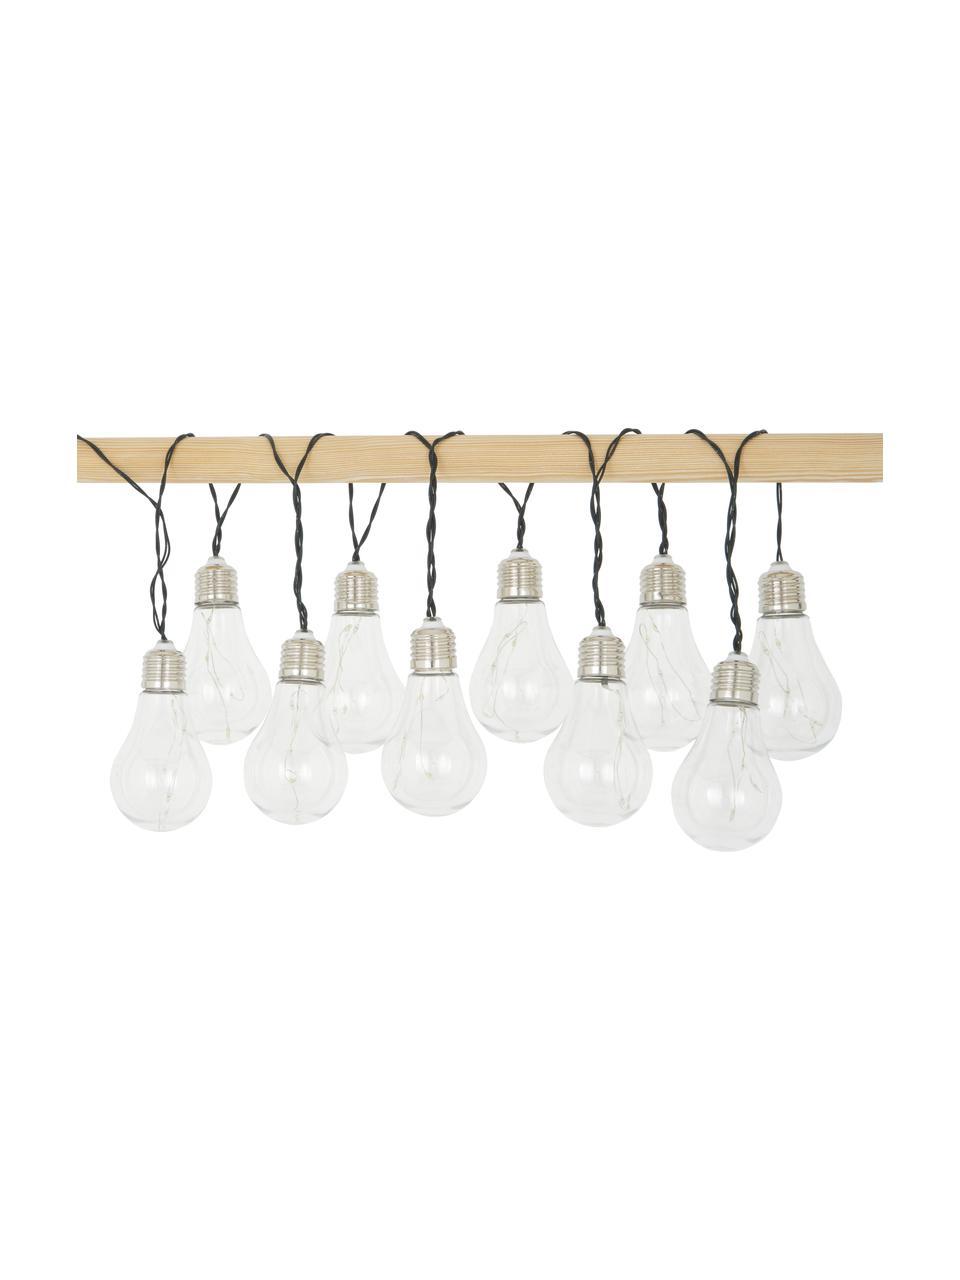 Solar Lichterkette Martin, 300 cm, 10 Lampions, Lampions: Kunststoff, Lampenschirme: Transparent mit Splitter-Effekt Lampenfassungen: Nickel, L 300 cm